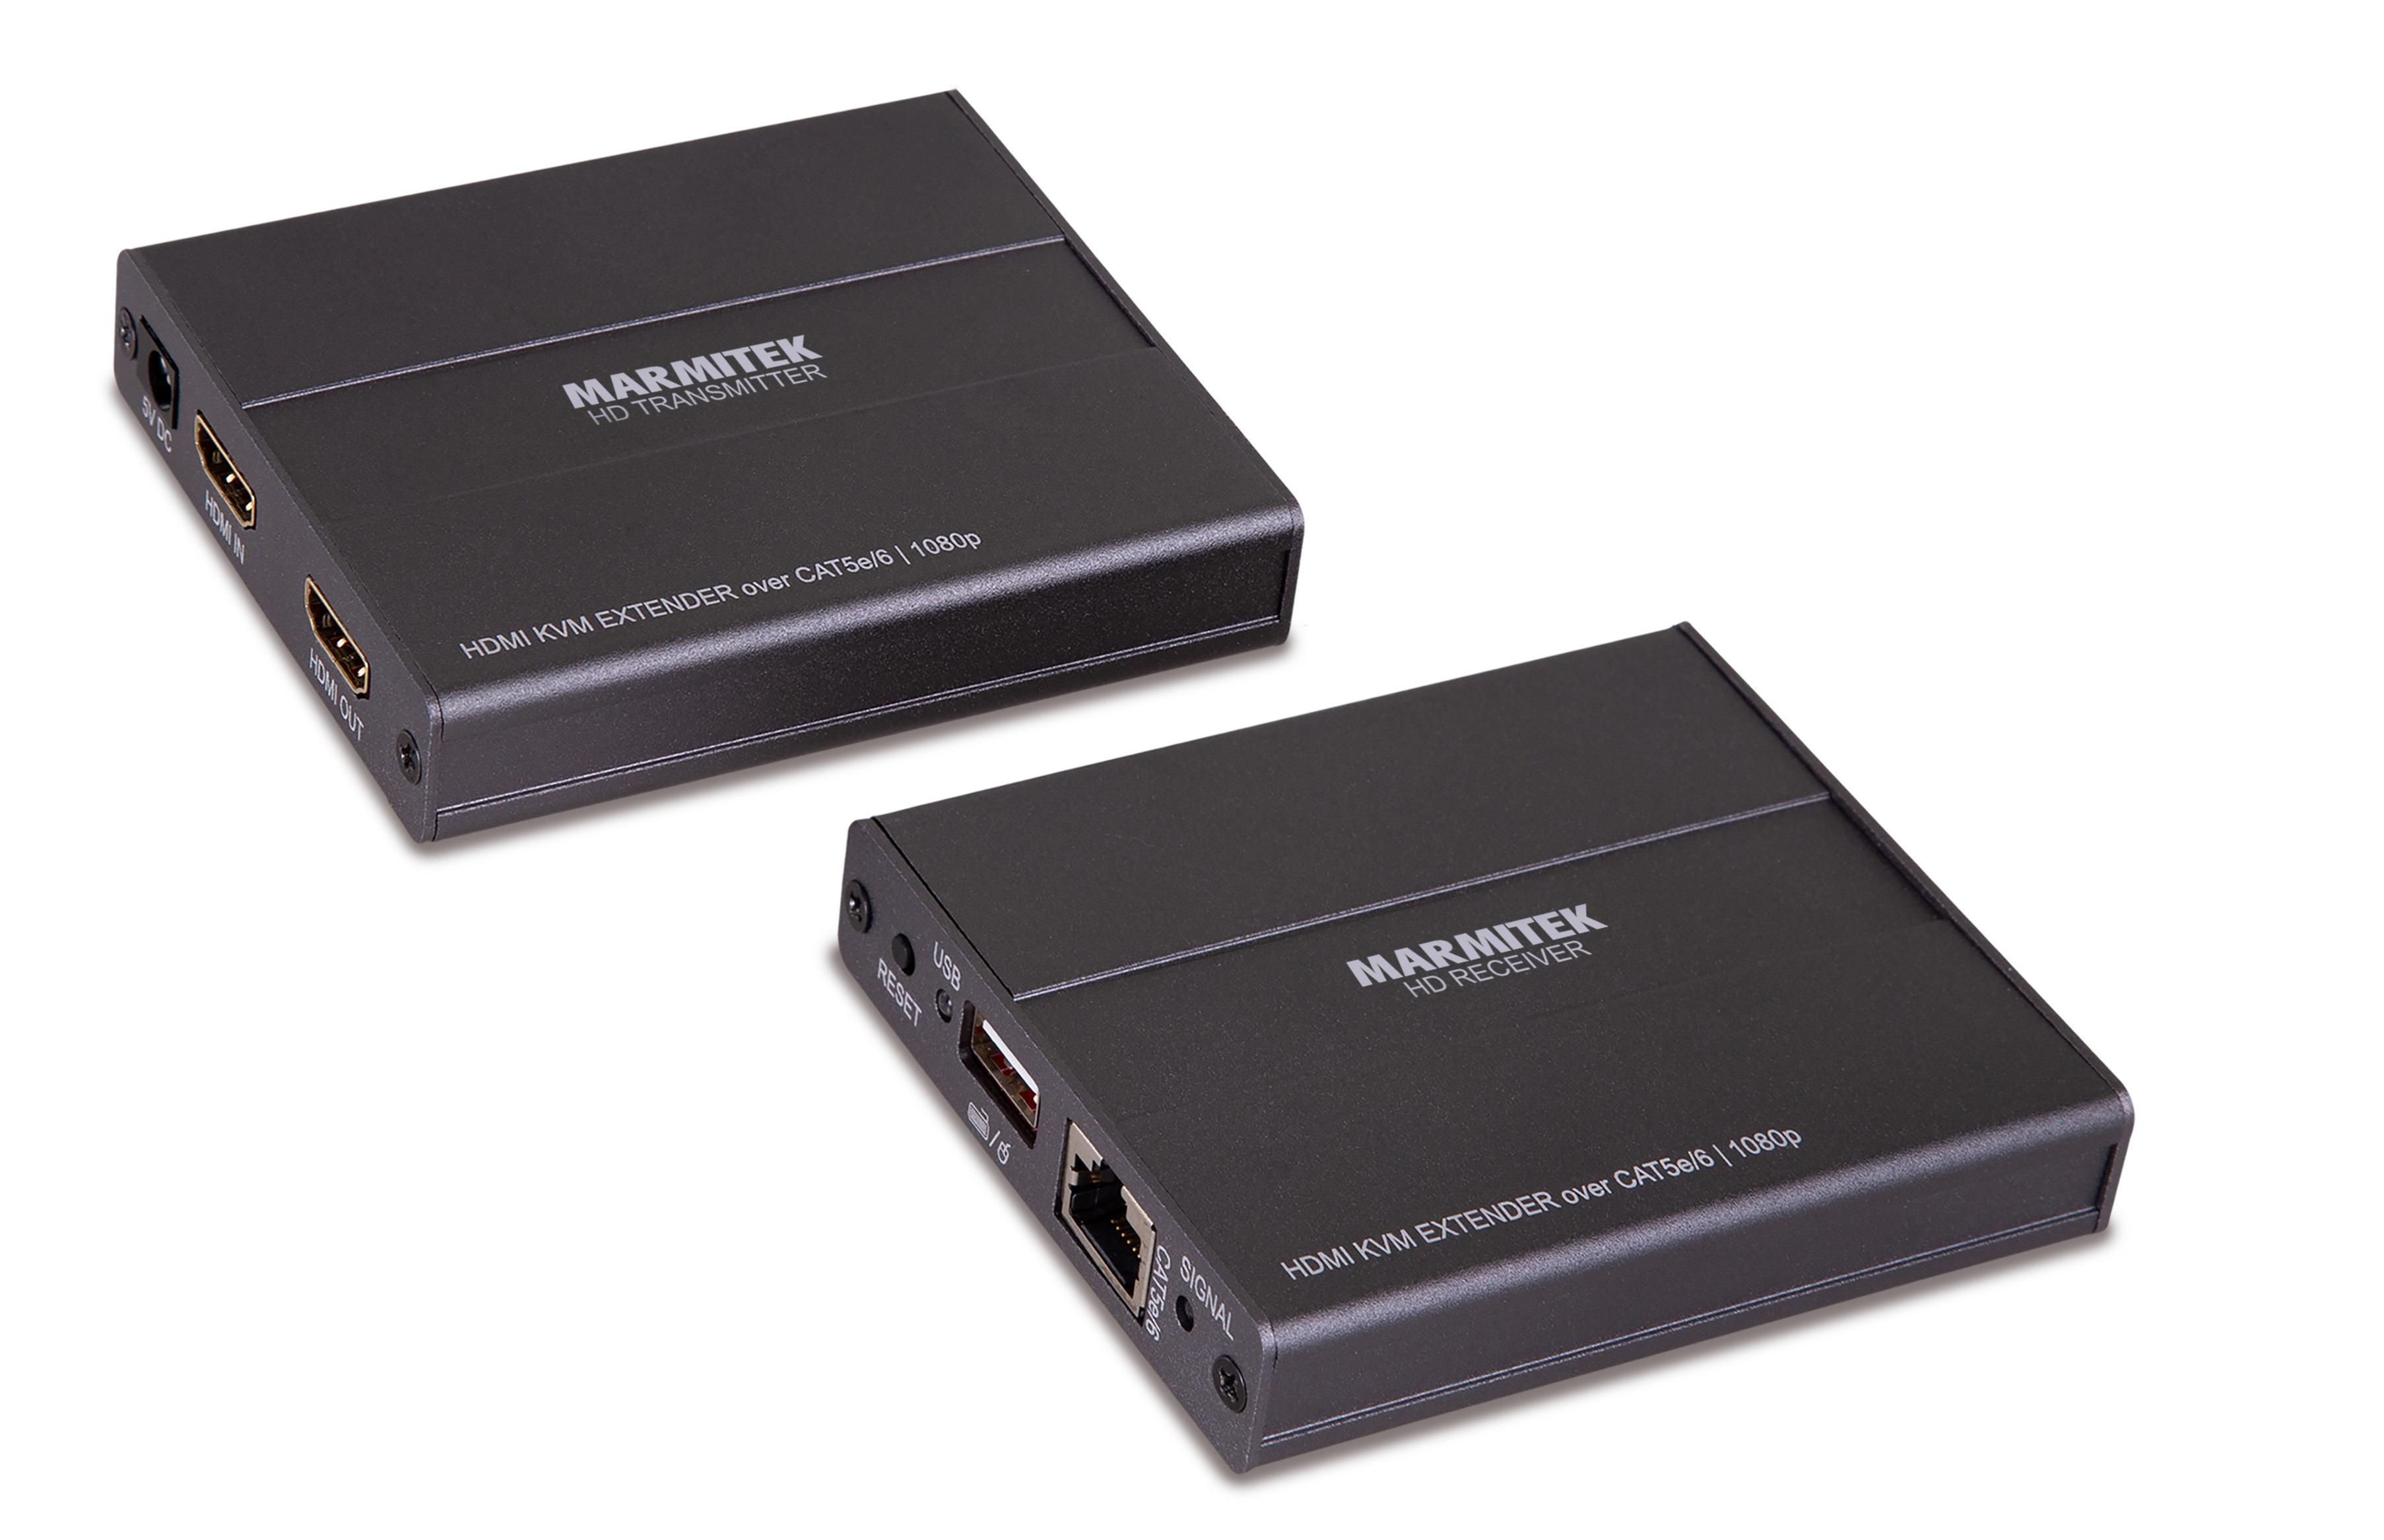 Marmitek extender MegaView 76